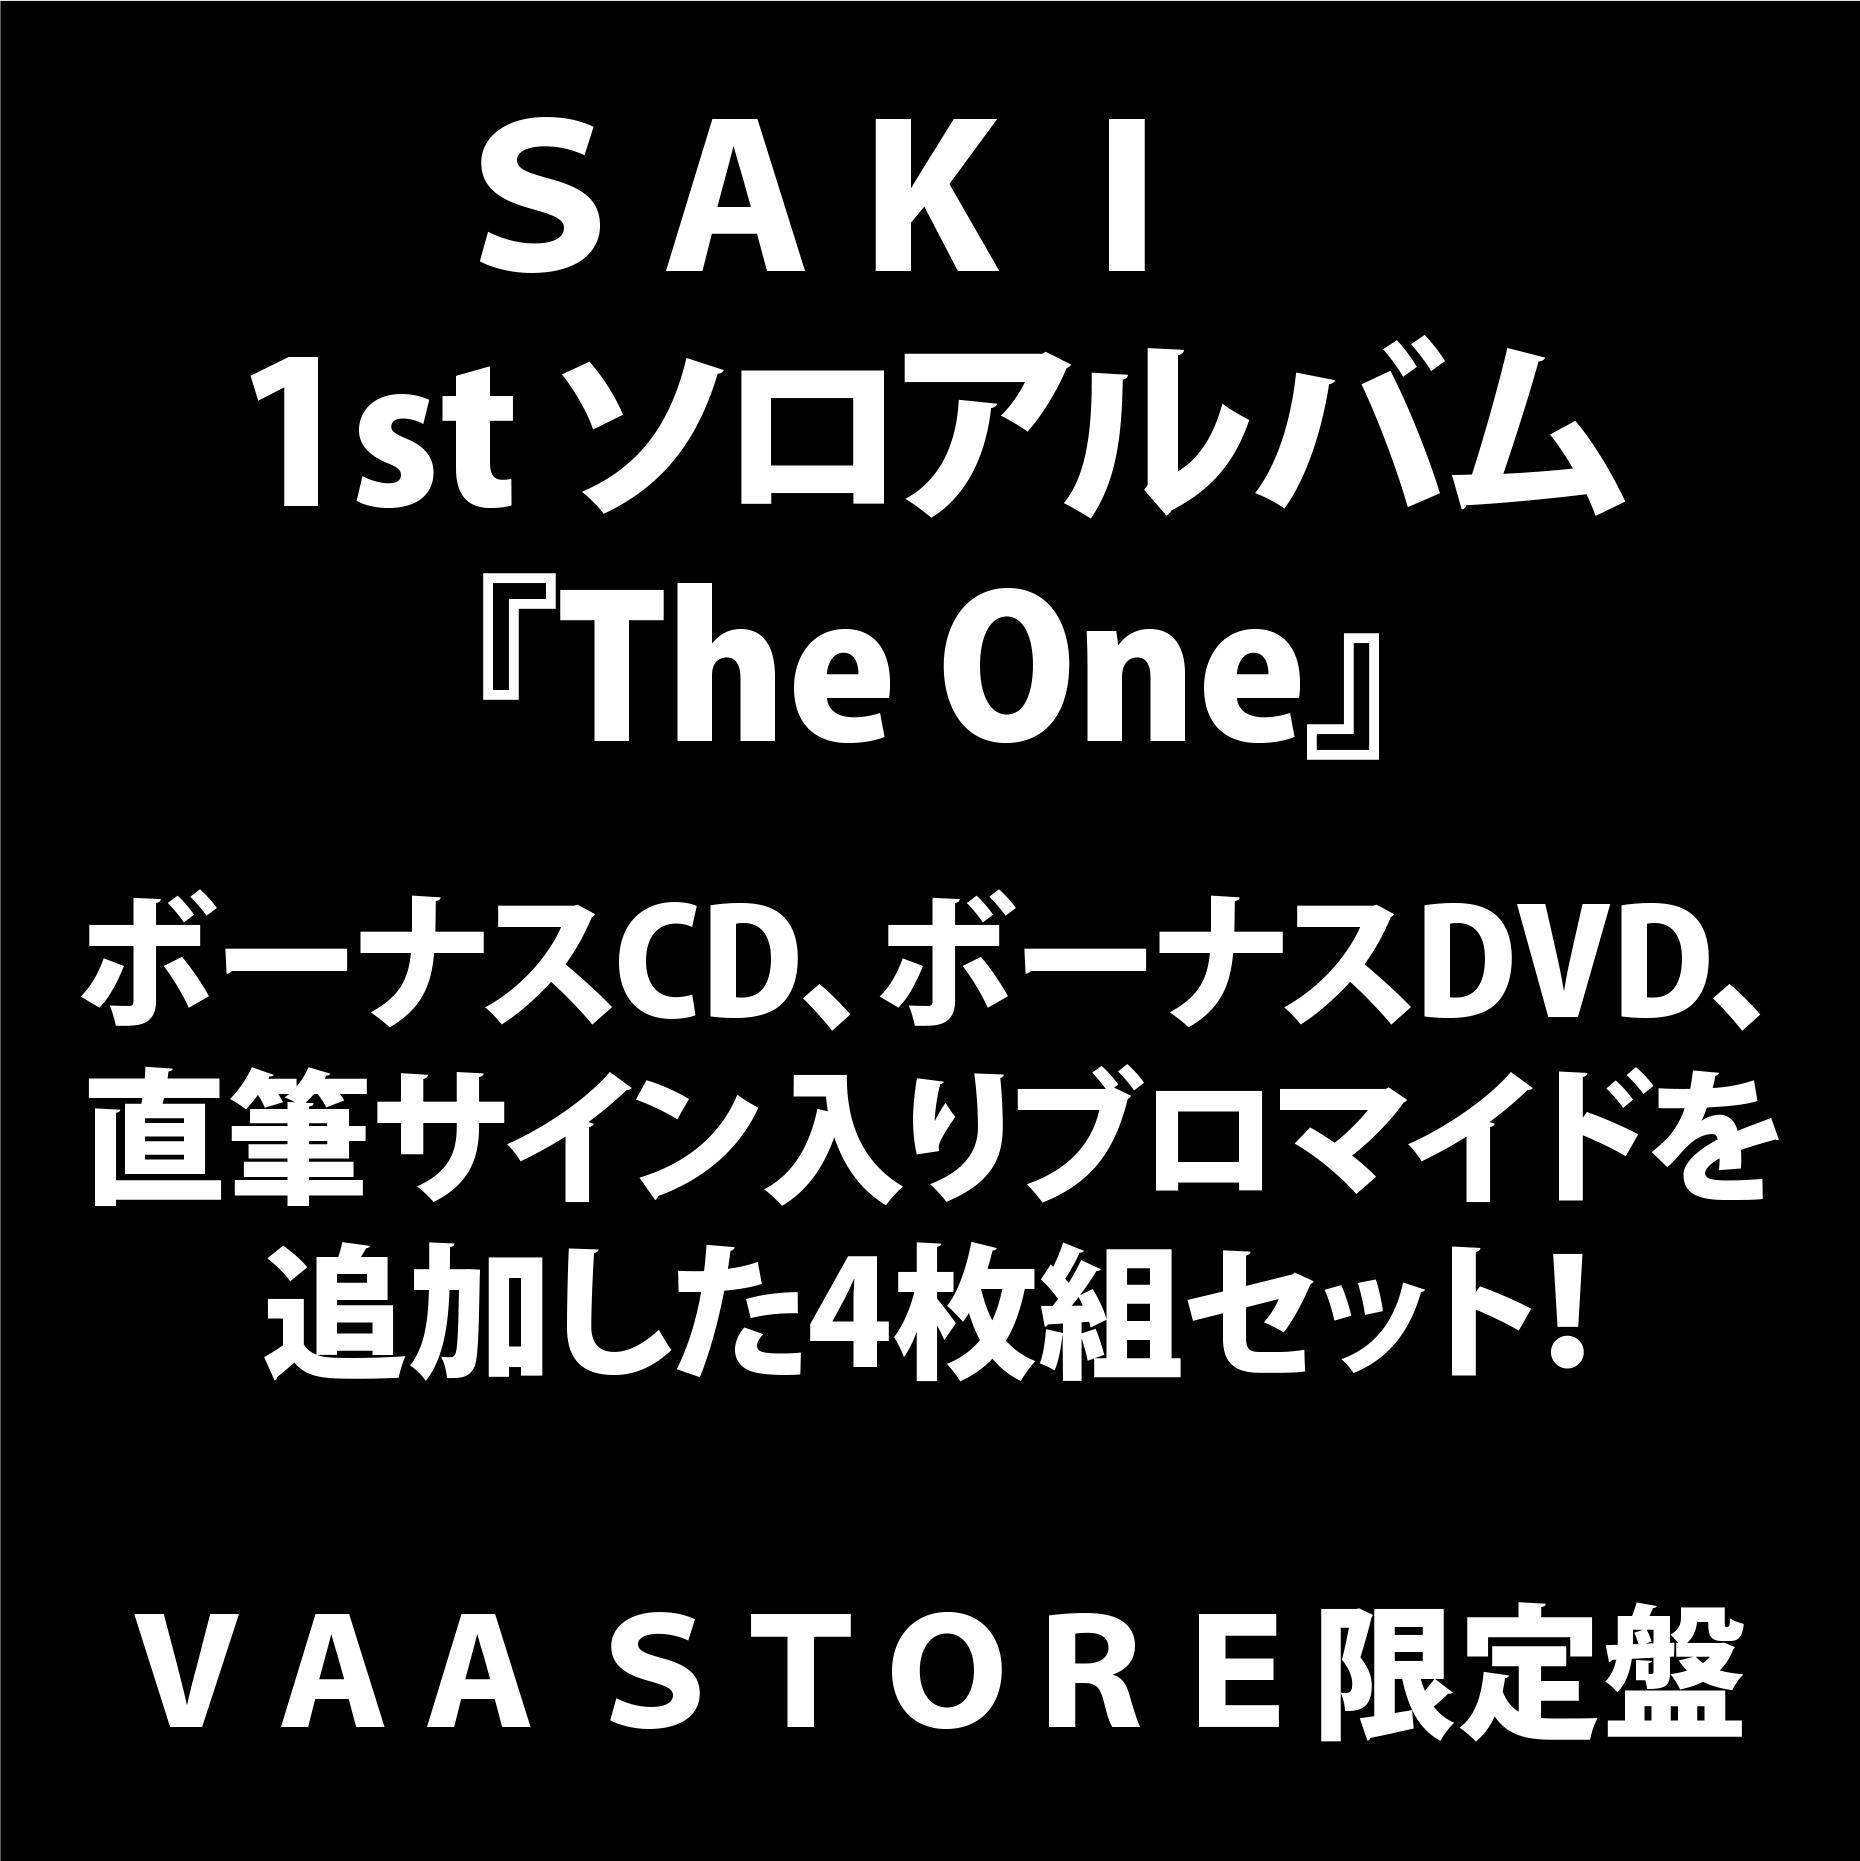 SAKI『The One』【VAA STORE限定盤】(2CD+2DVD)